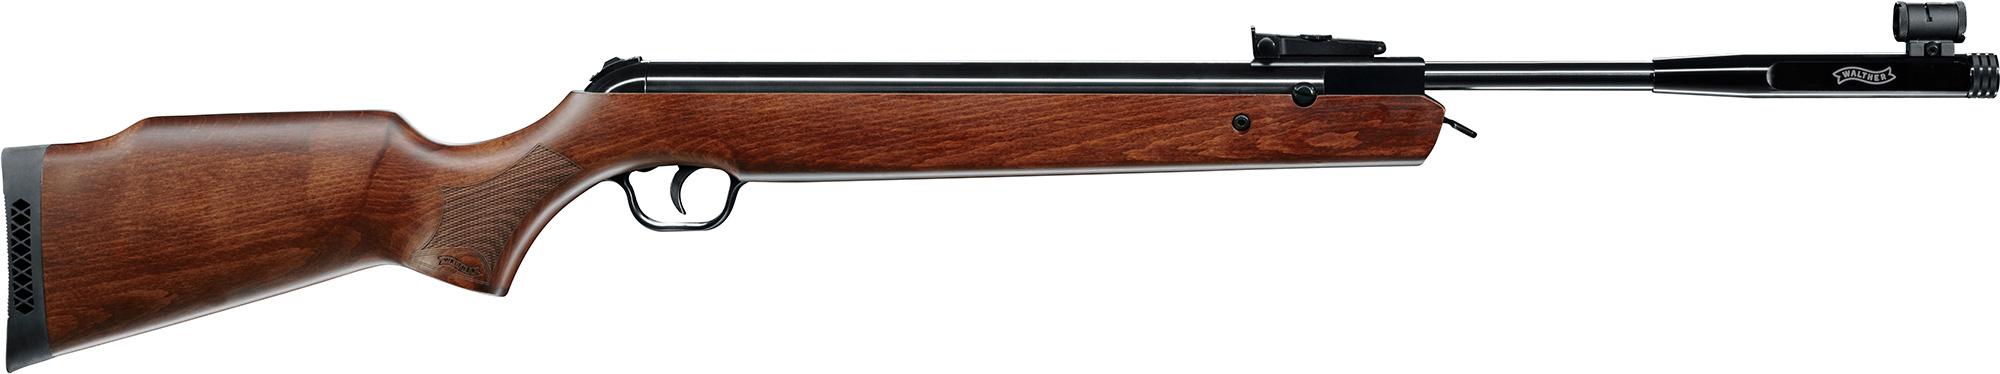 Walther LGV